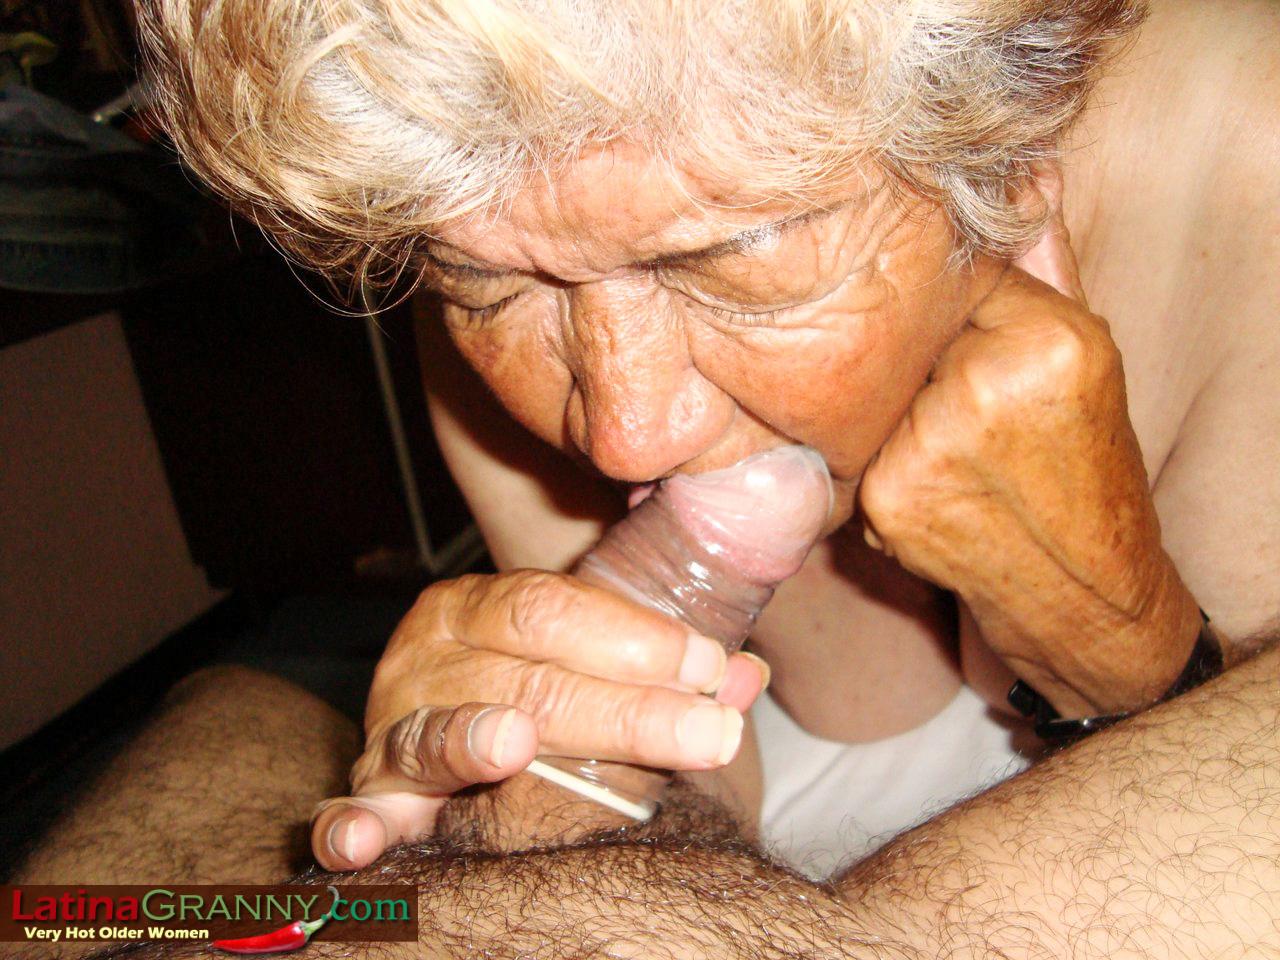 The latina granny sucks just cant